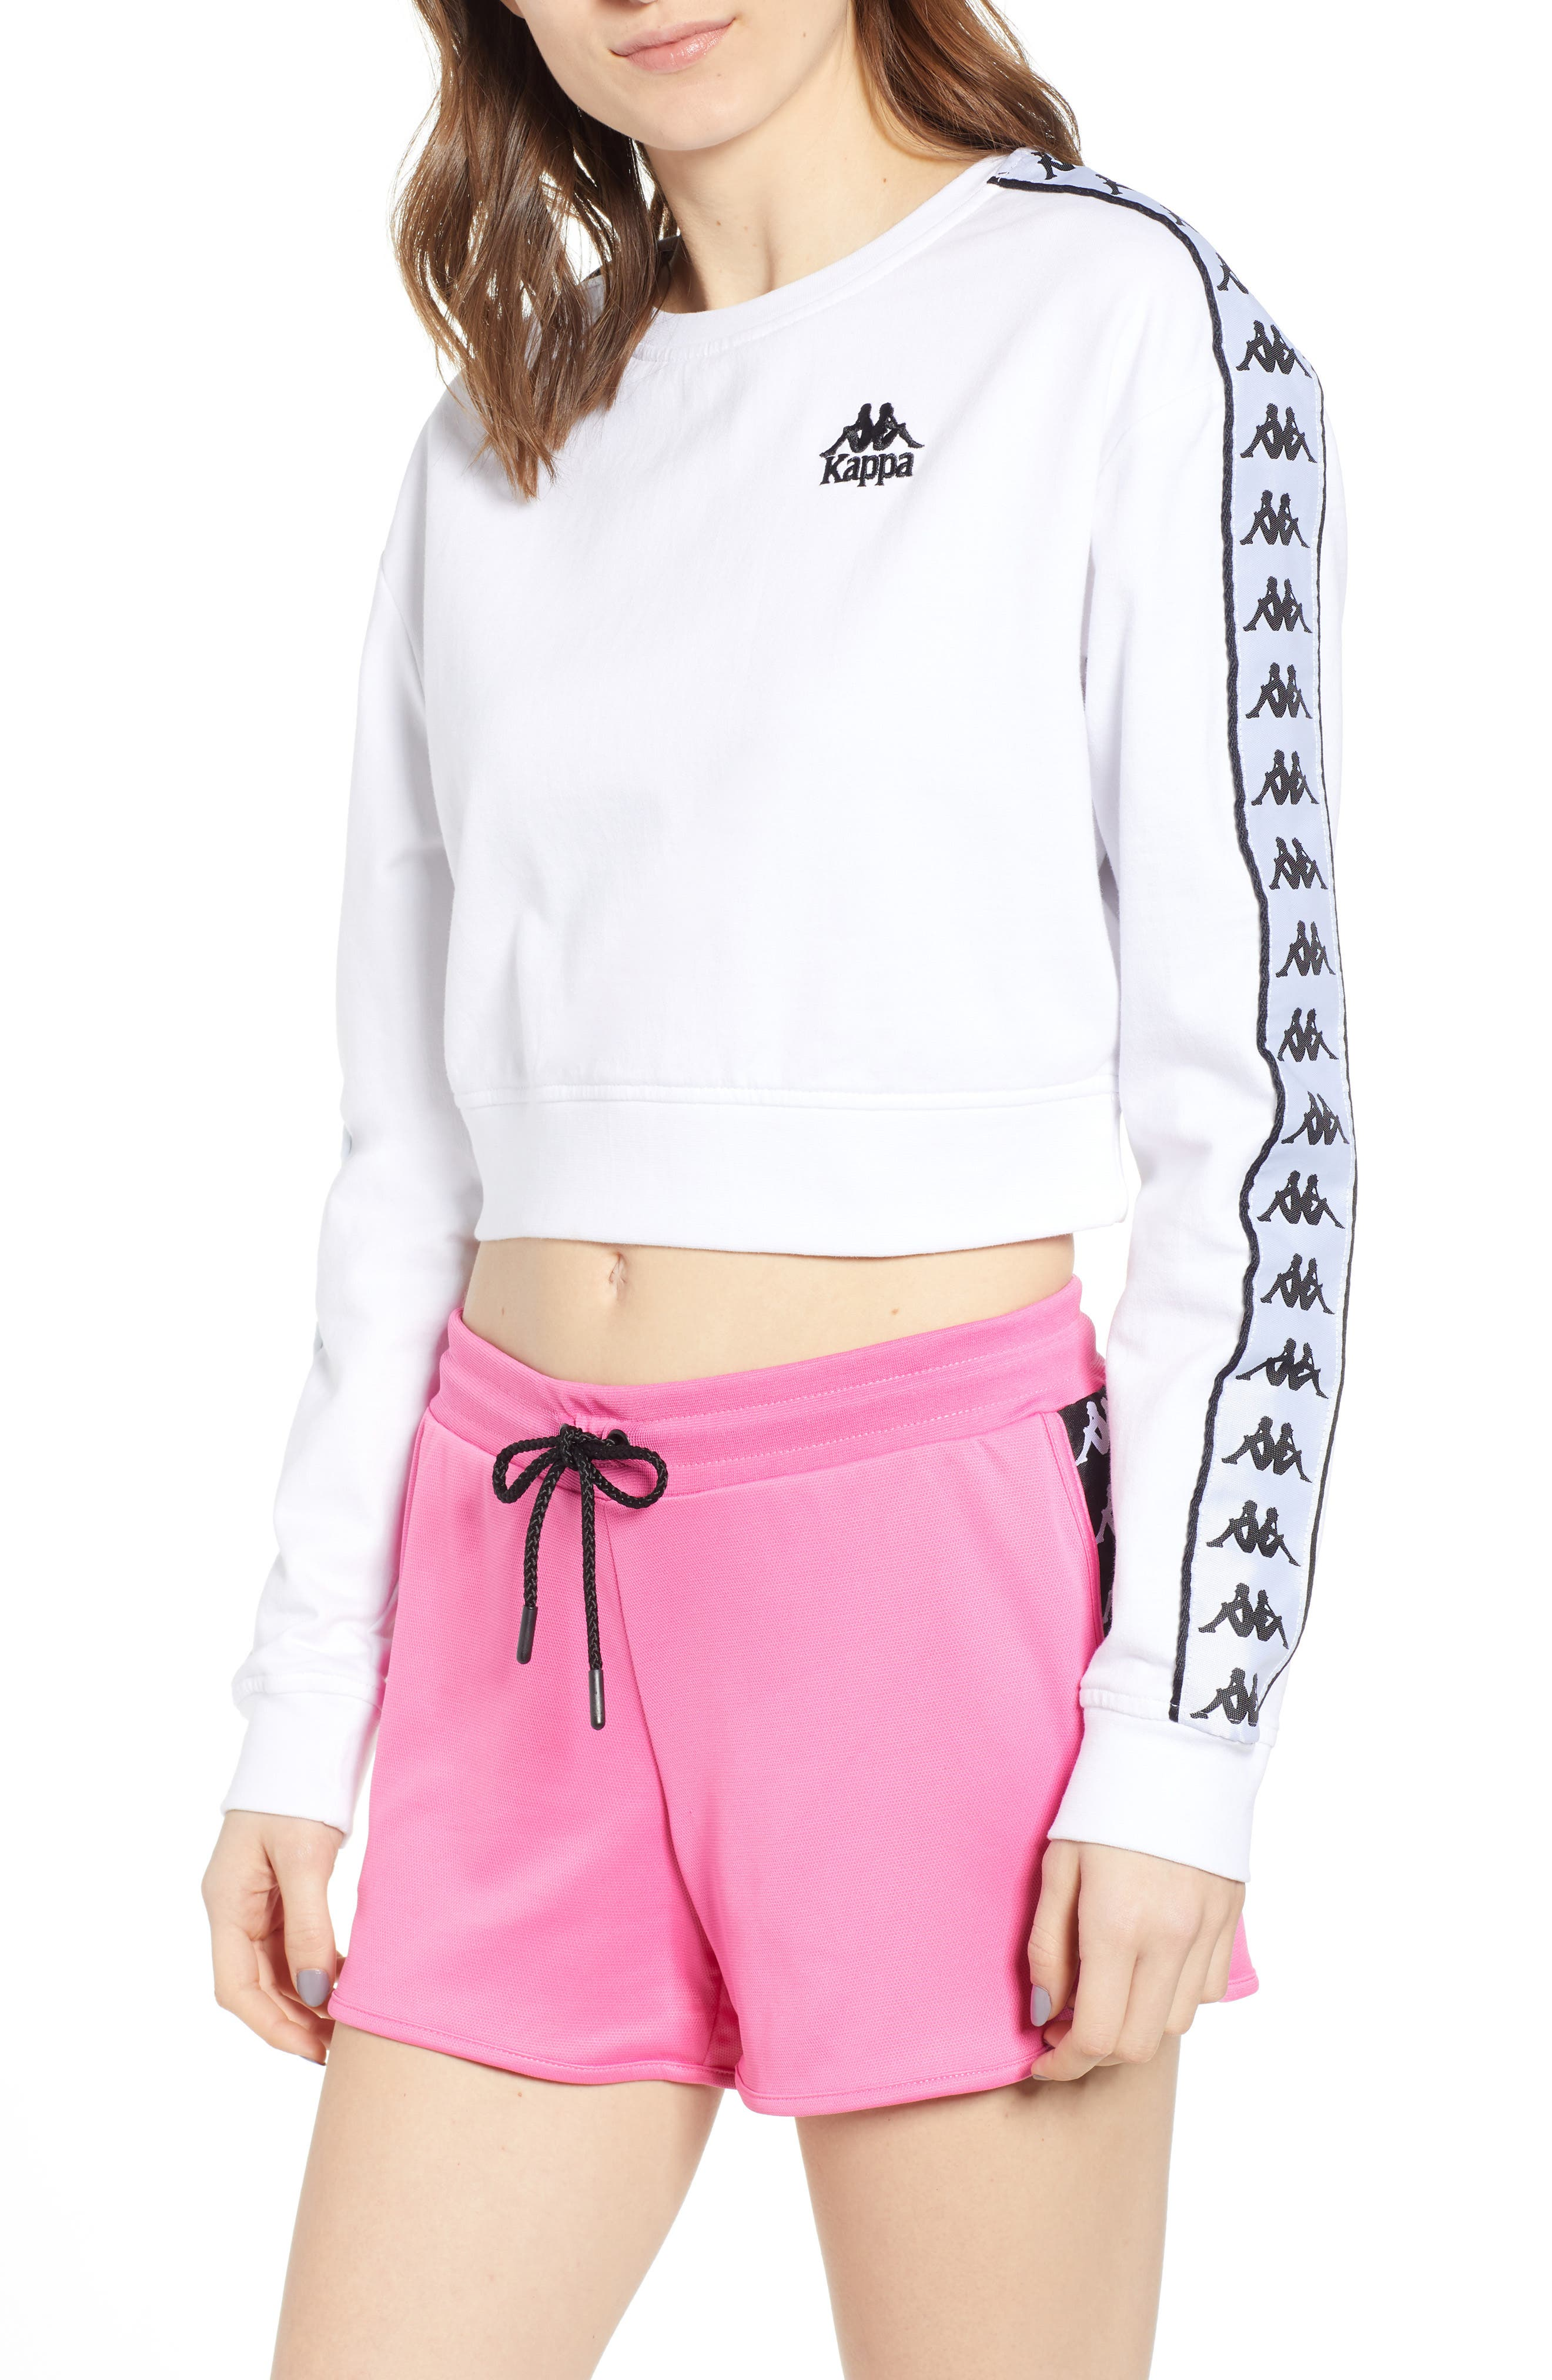 b0a724f1167b04 Women s Kappa Clothing